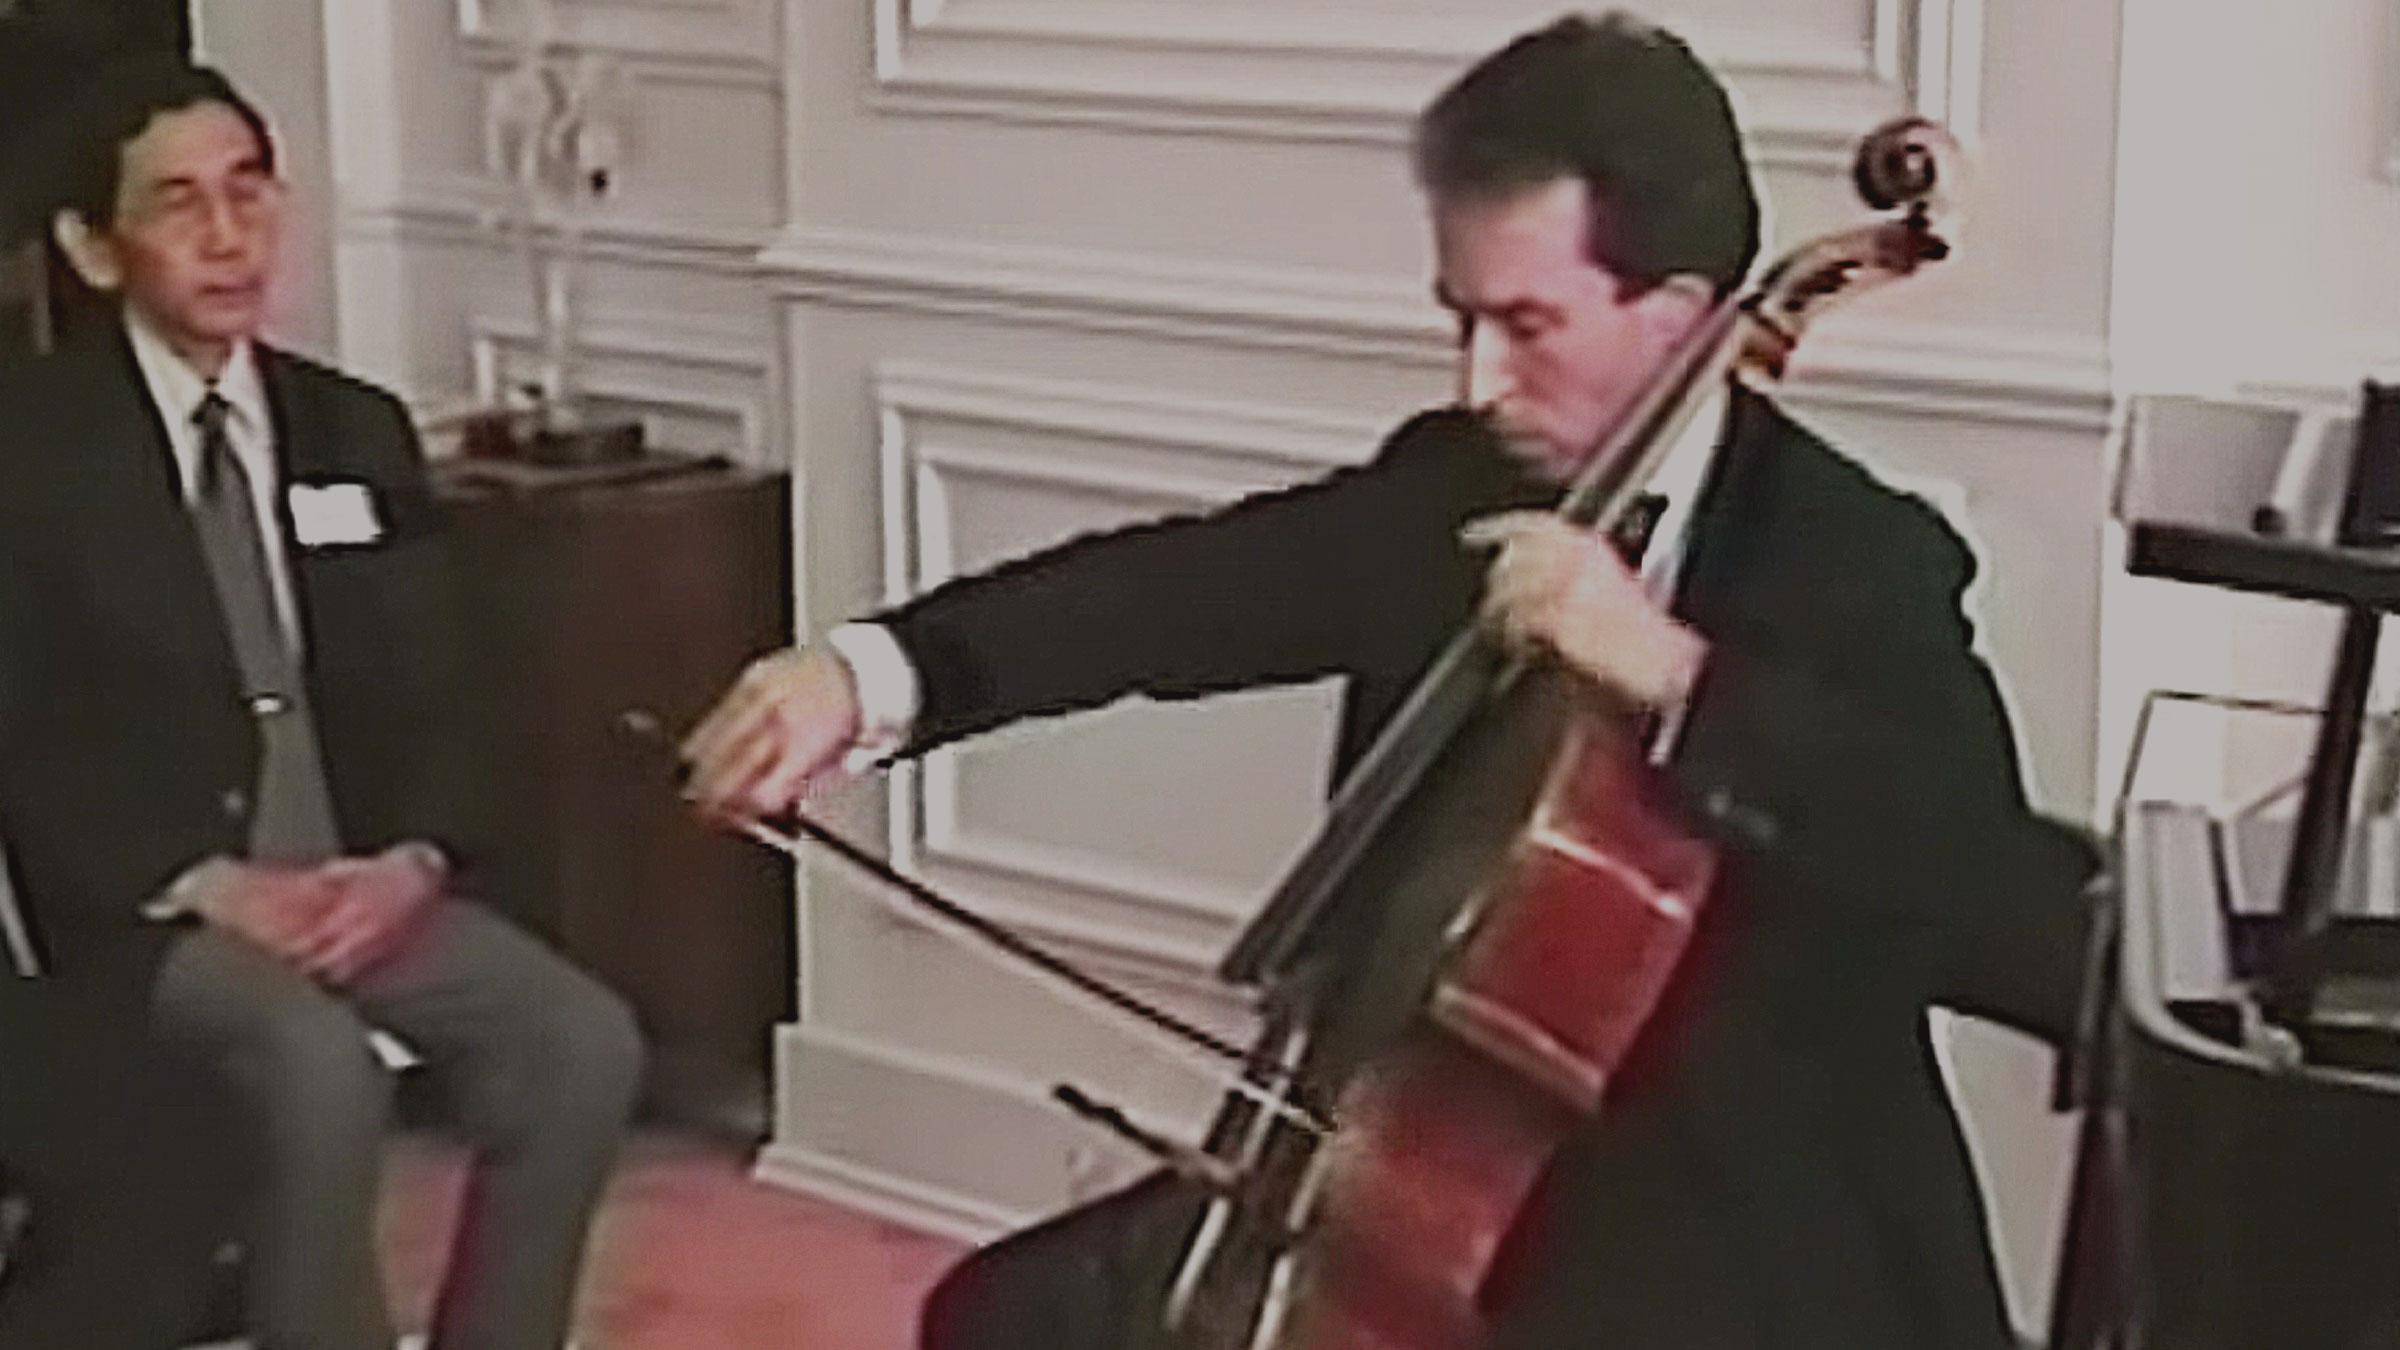 Nathaniel Rosen and Ayke Agus perform Debussy Beau Soir